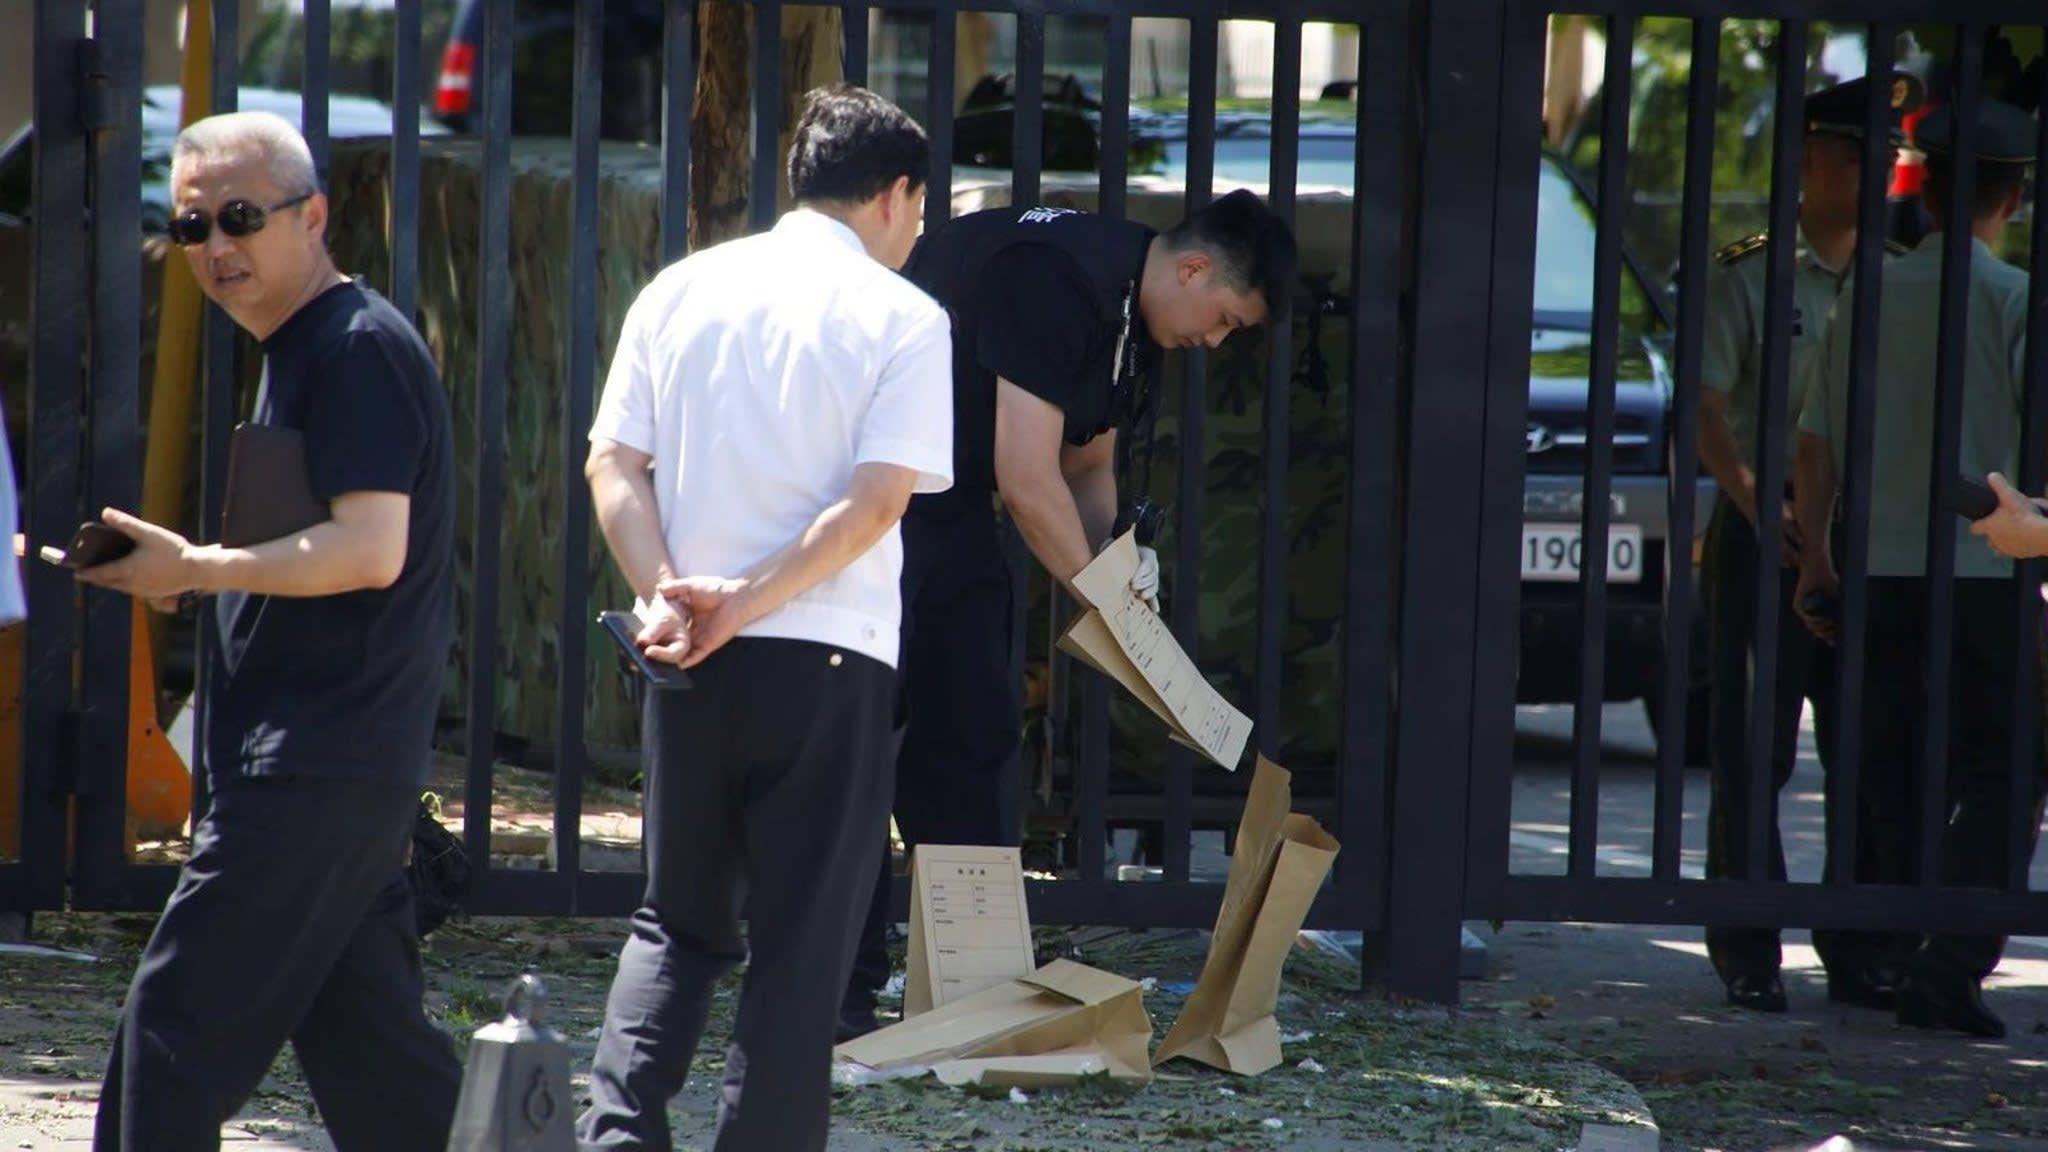 Bomb explodes near US embassy in Beijing